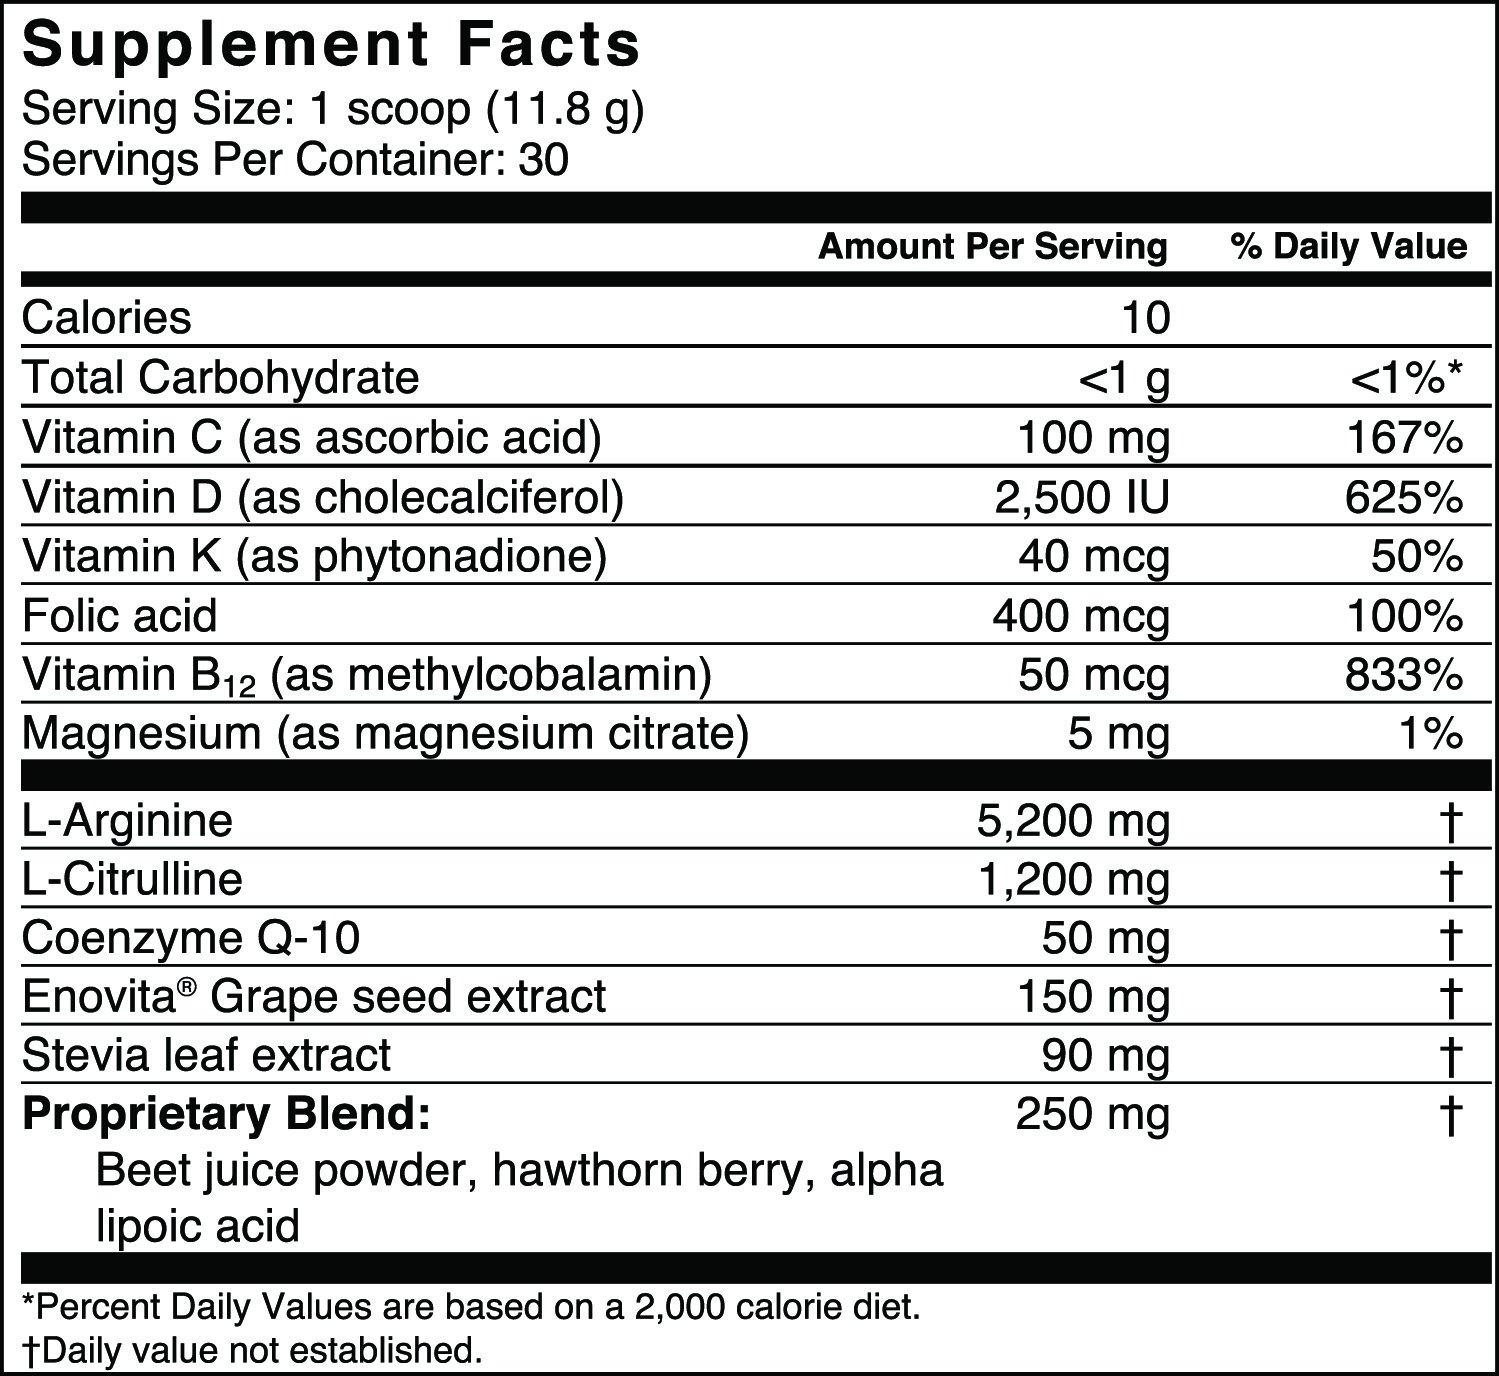 Cardio Defender - Cardio Heart Health - L-Arginine Supplement with 5,200mg L-Arginine & 1,200mg L-Citrulline - Heart Health Drink Mix - Supports Blood Pressure, Cholesterol & Energy by Cardio Defender